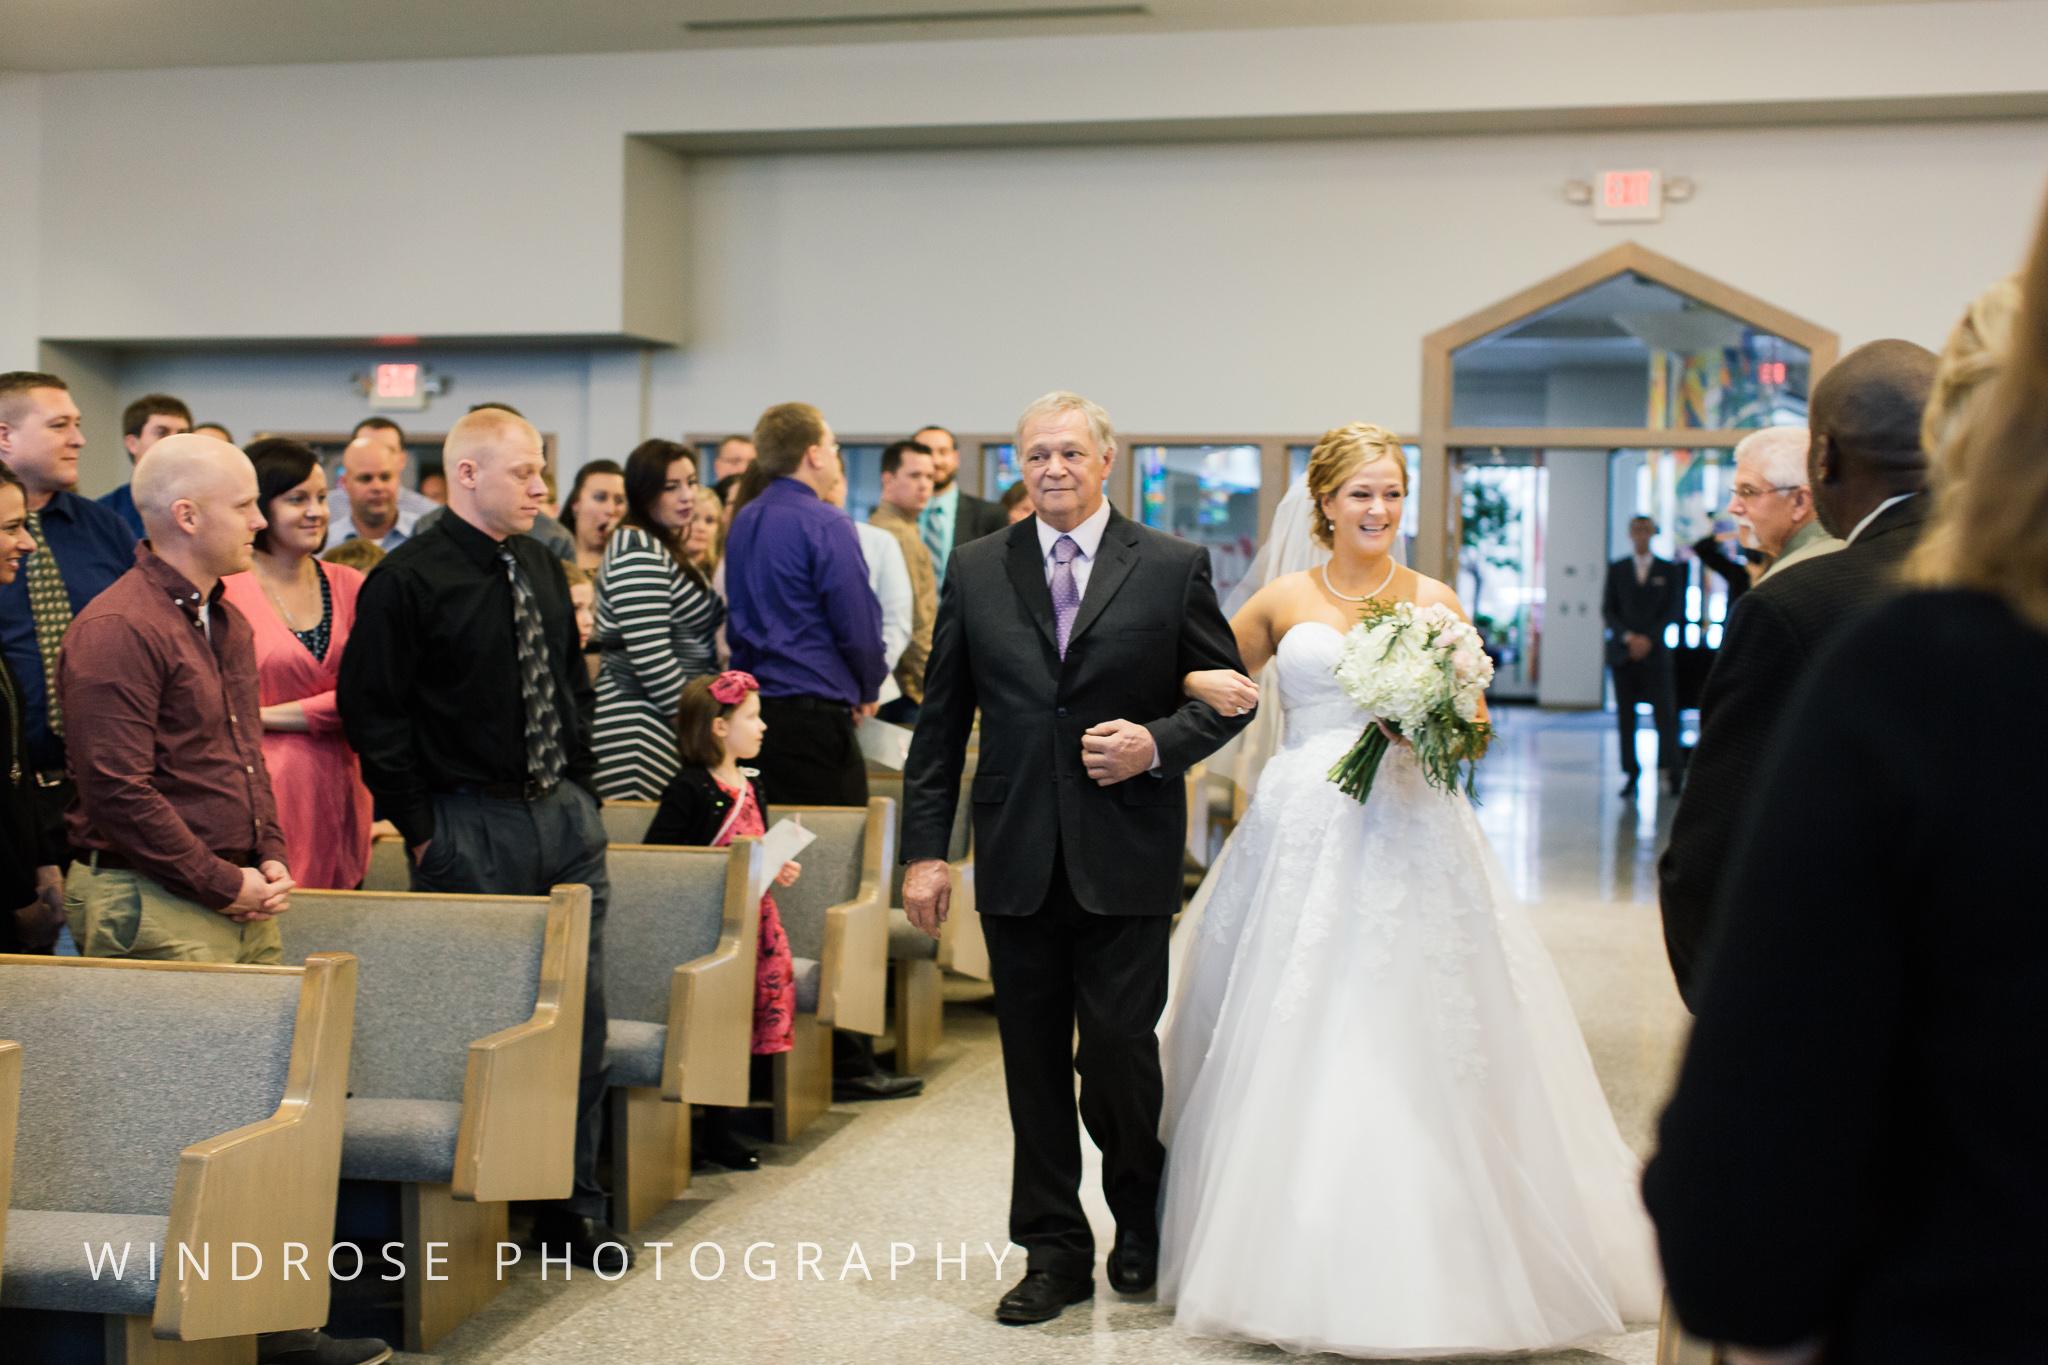 Rochester-MN-Wedding-Photo-21.jpg